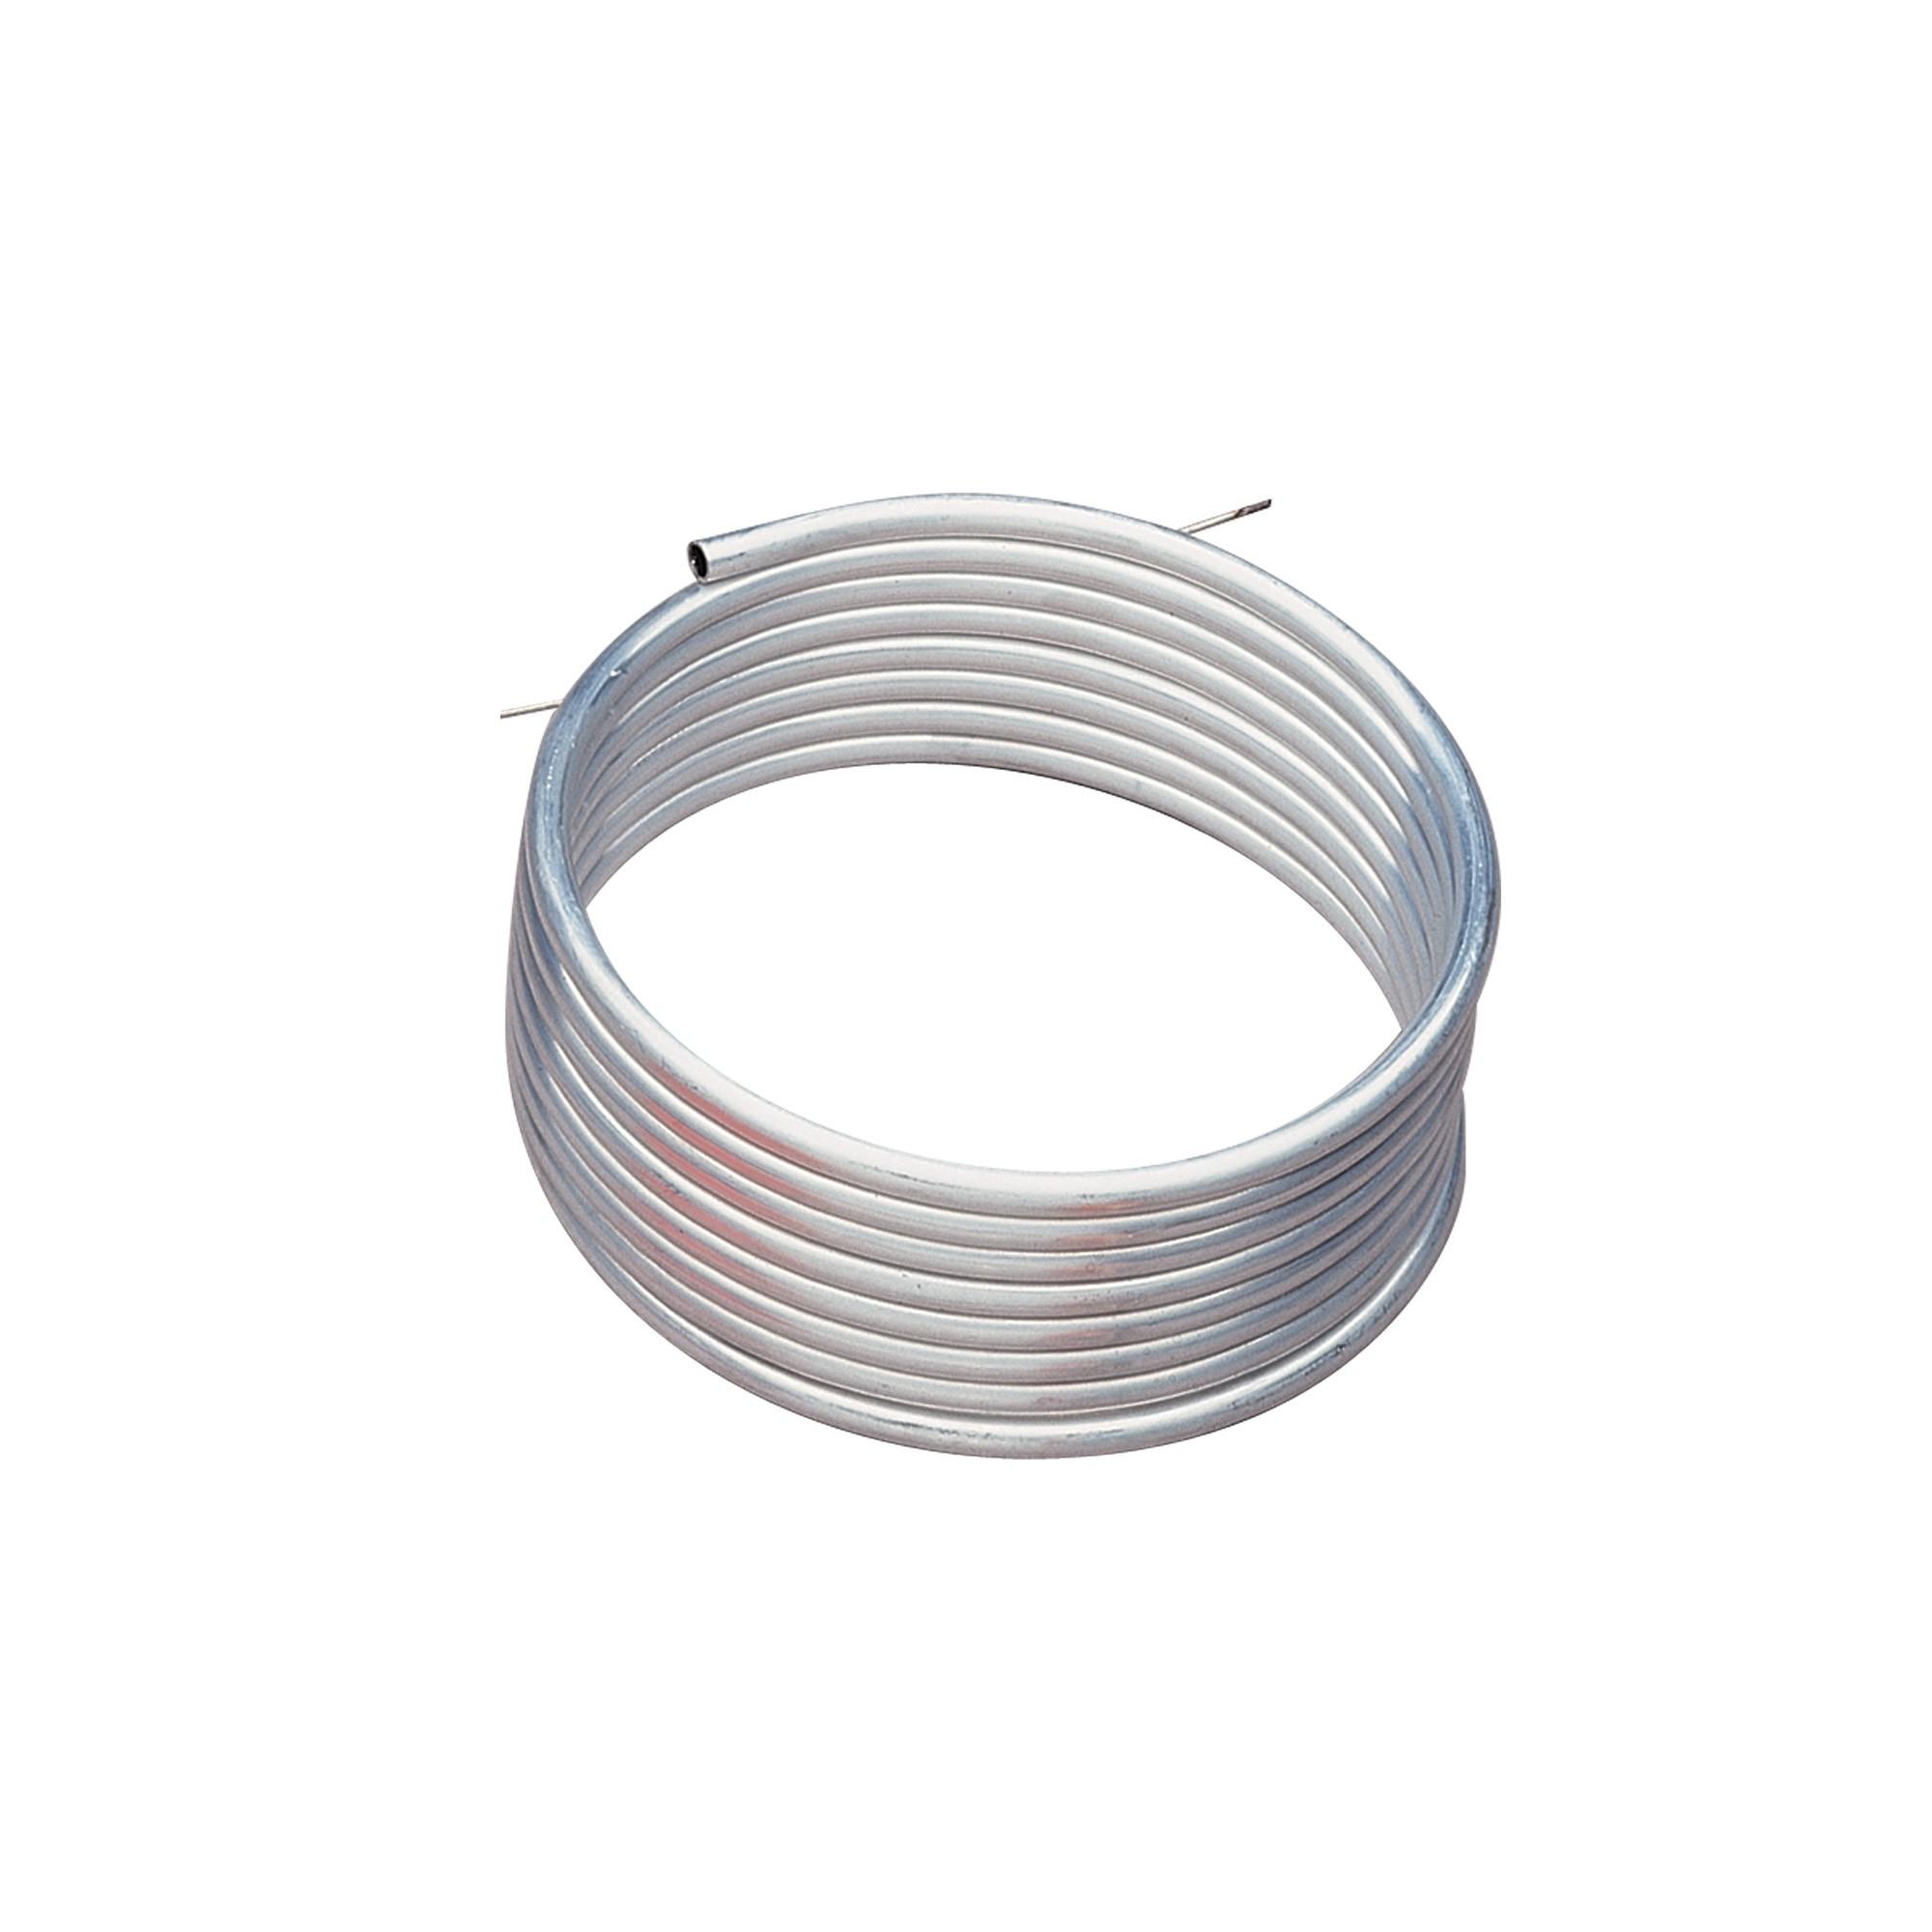 ALUMINIUM TUBING 8 mm